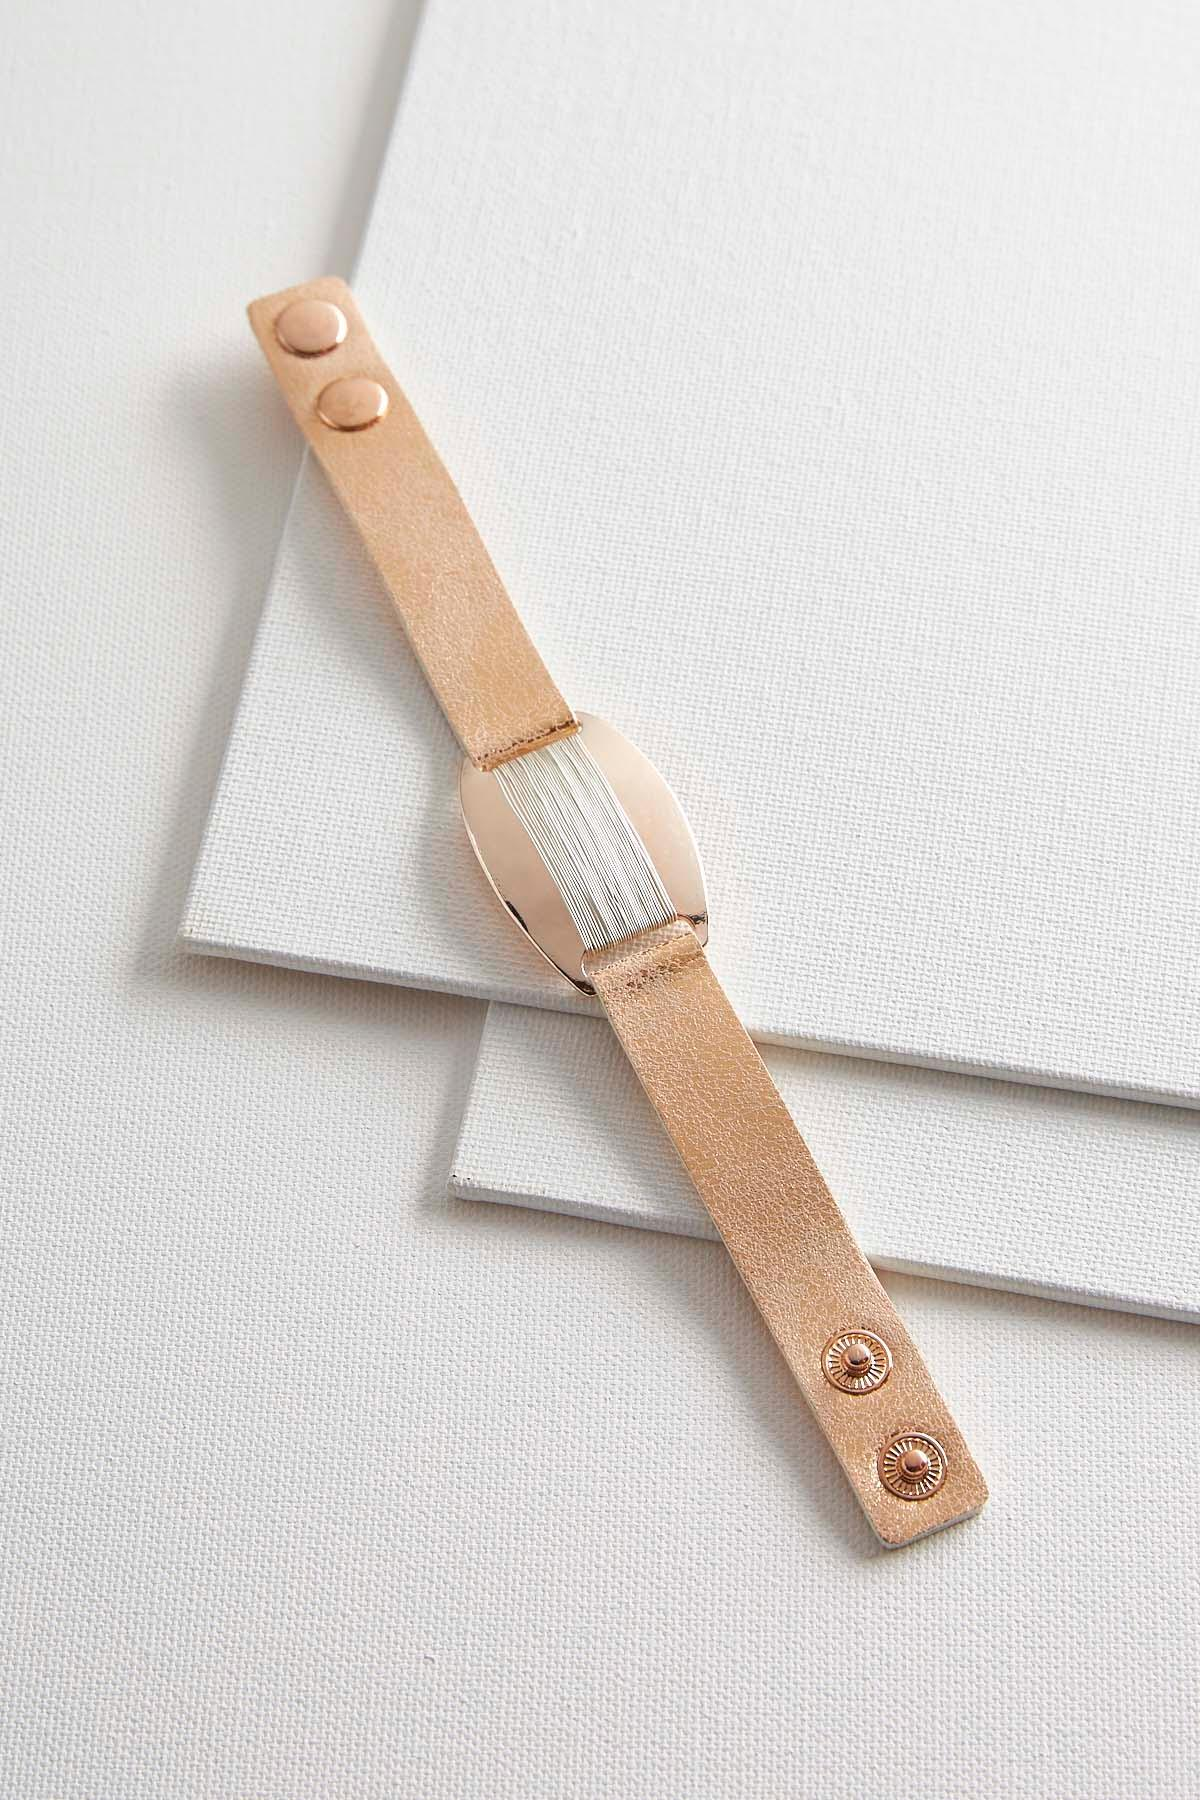 Wire Wrapped Faux Leather Bracelet